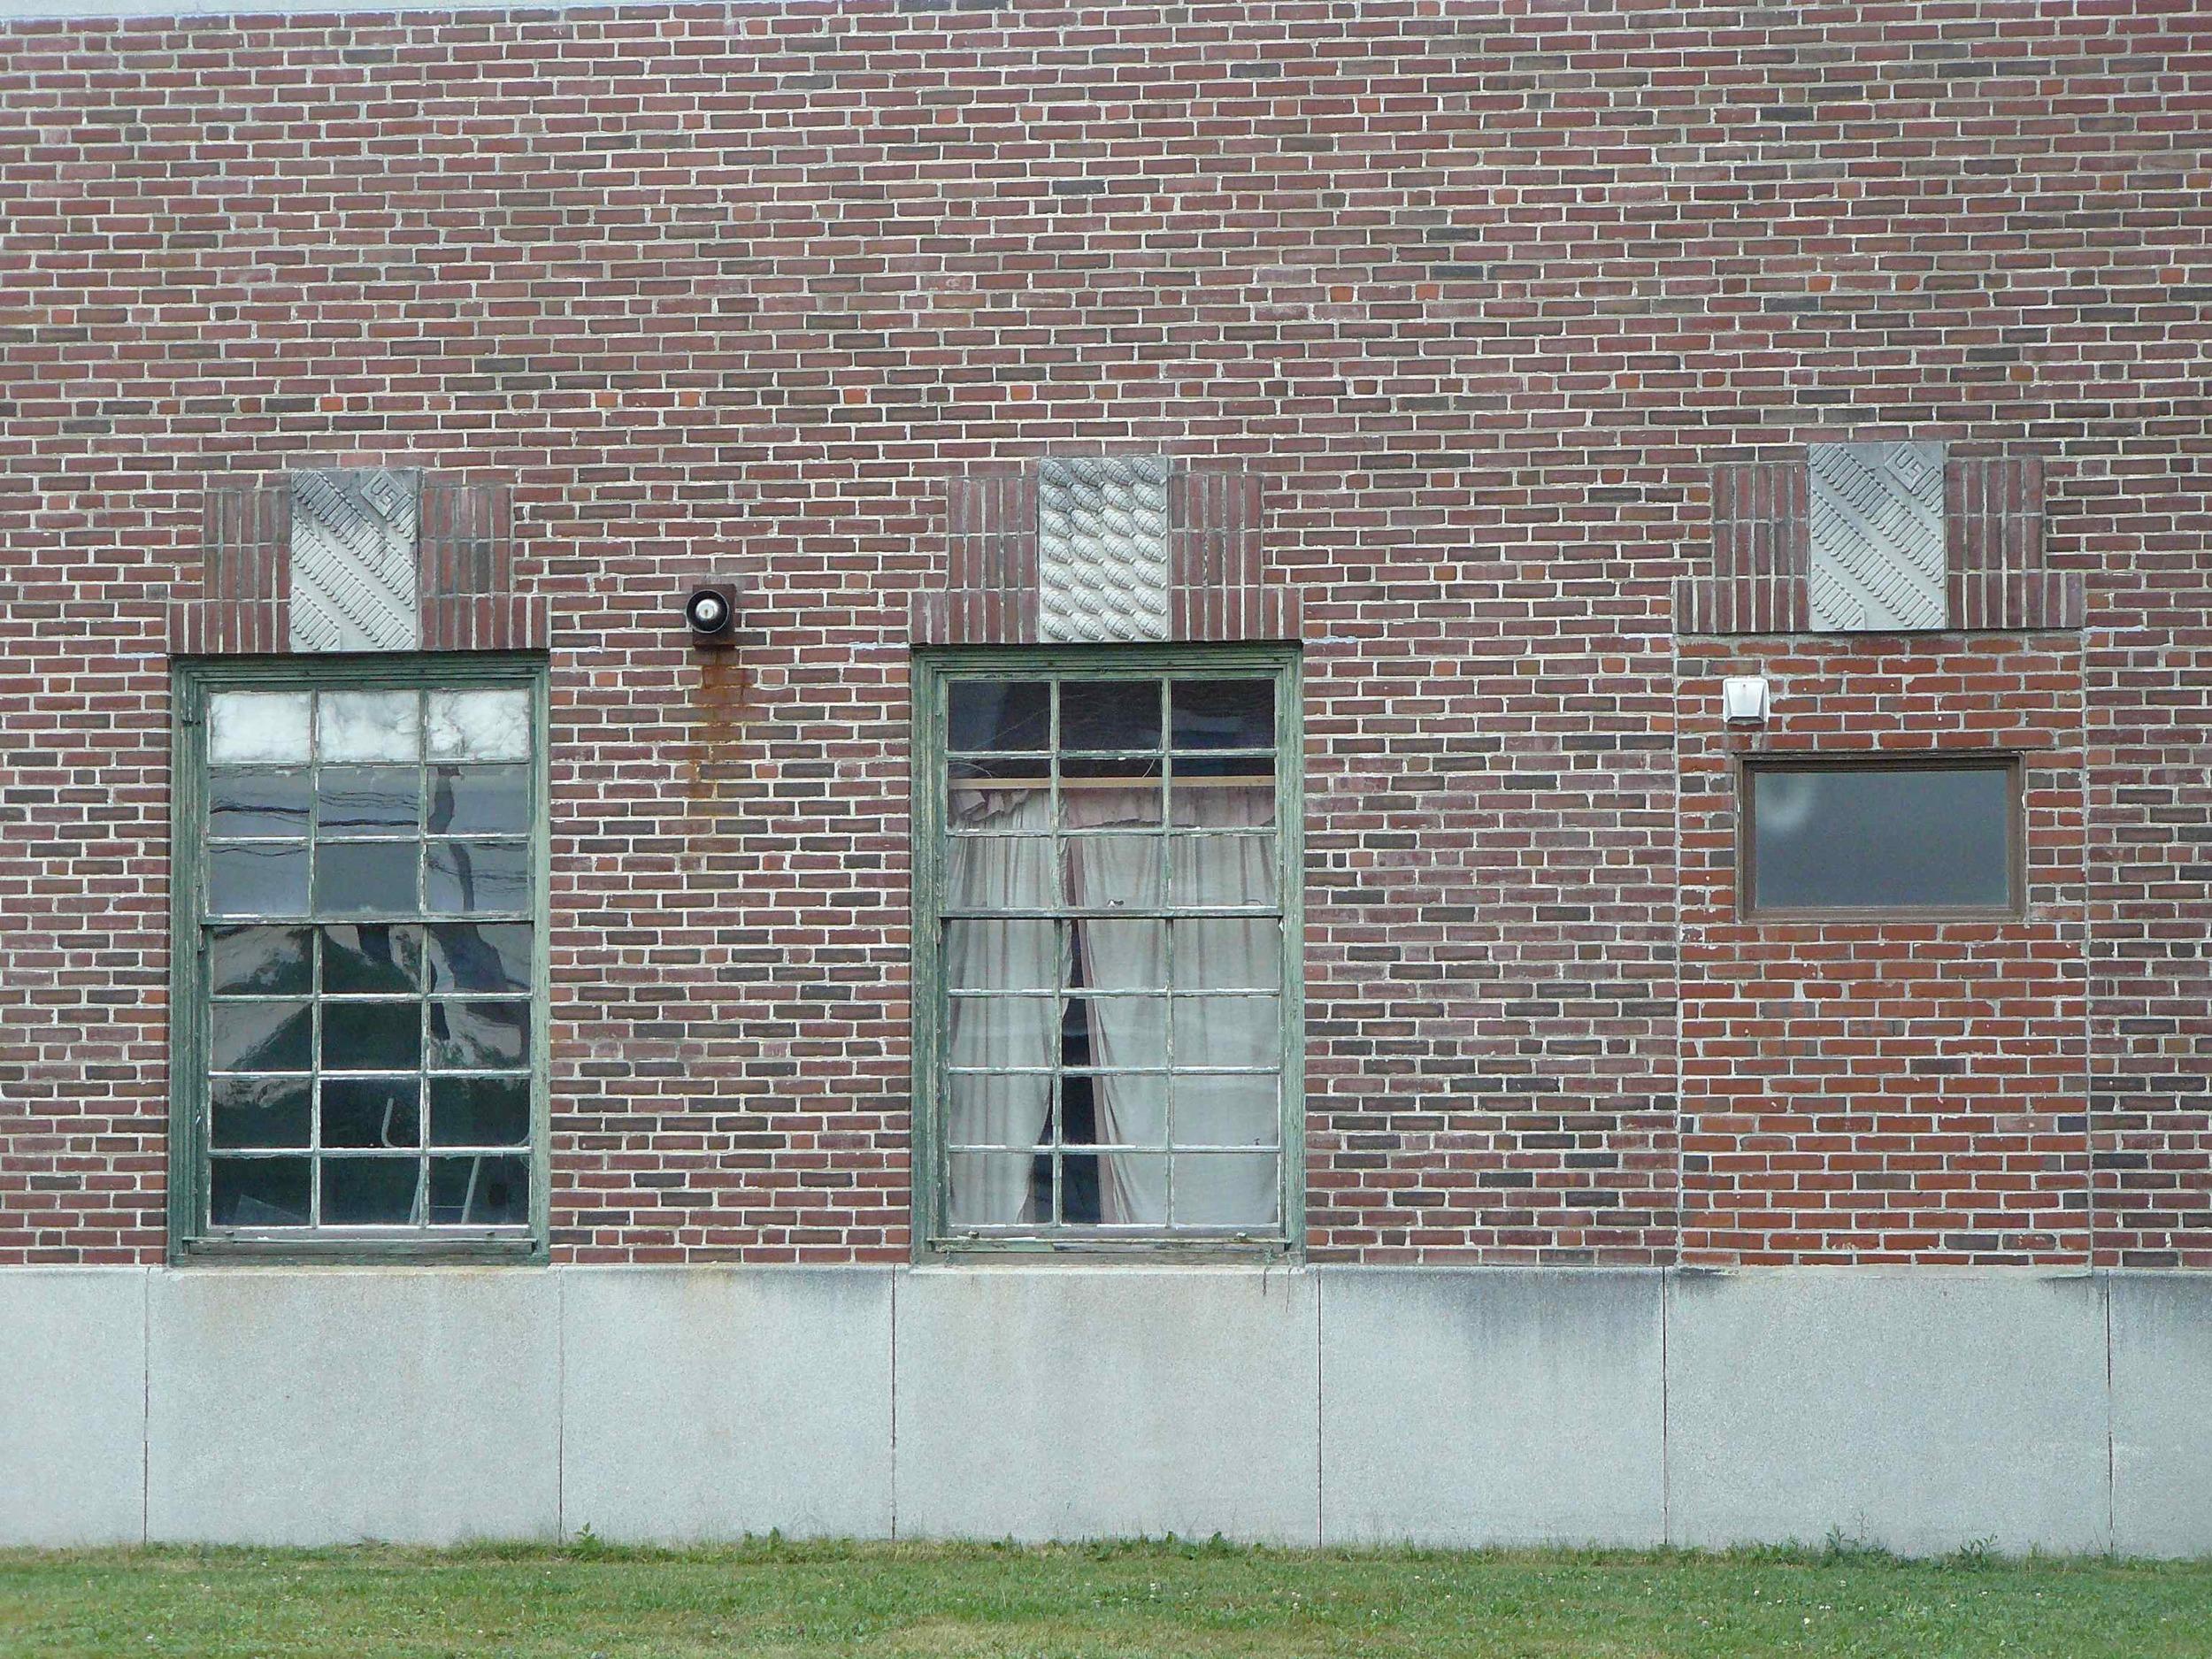 South_Portland_Armory_side_windows.jpg